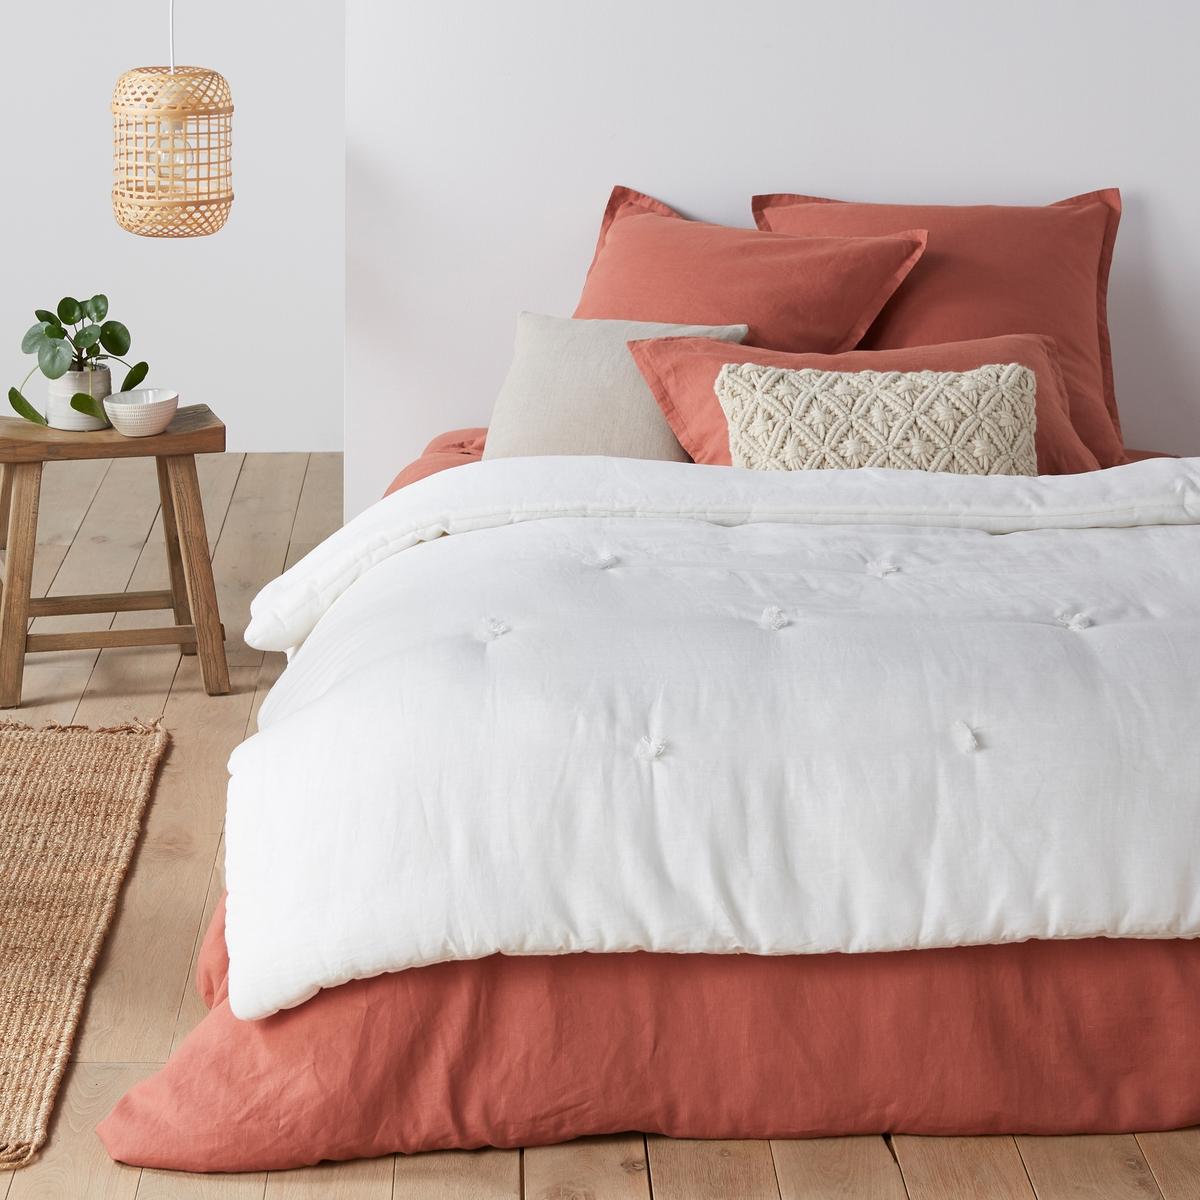 Одеяло La Redoute Из осветленного льна Abella 90 x 190 см белый комплект из полотенце для la redoute рук из хлопка и льна nipaly 50 x 100 см белый